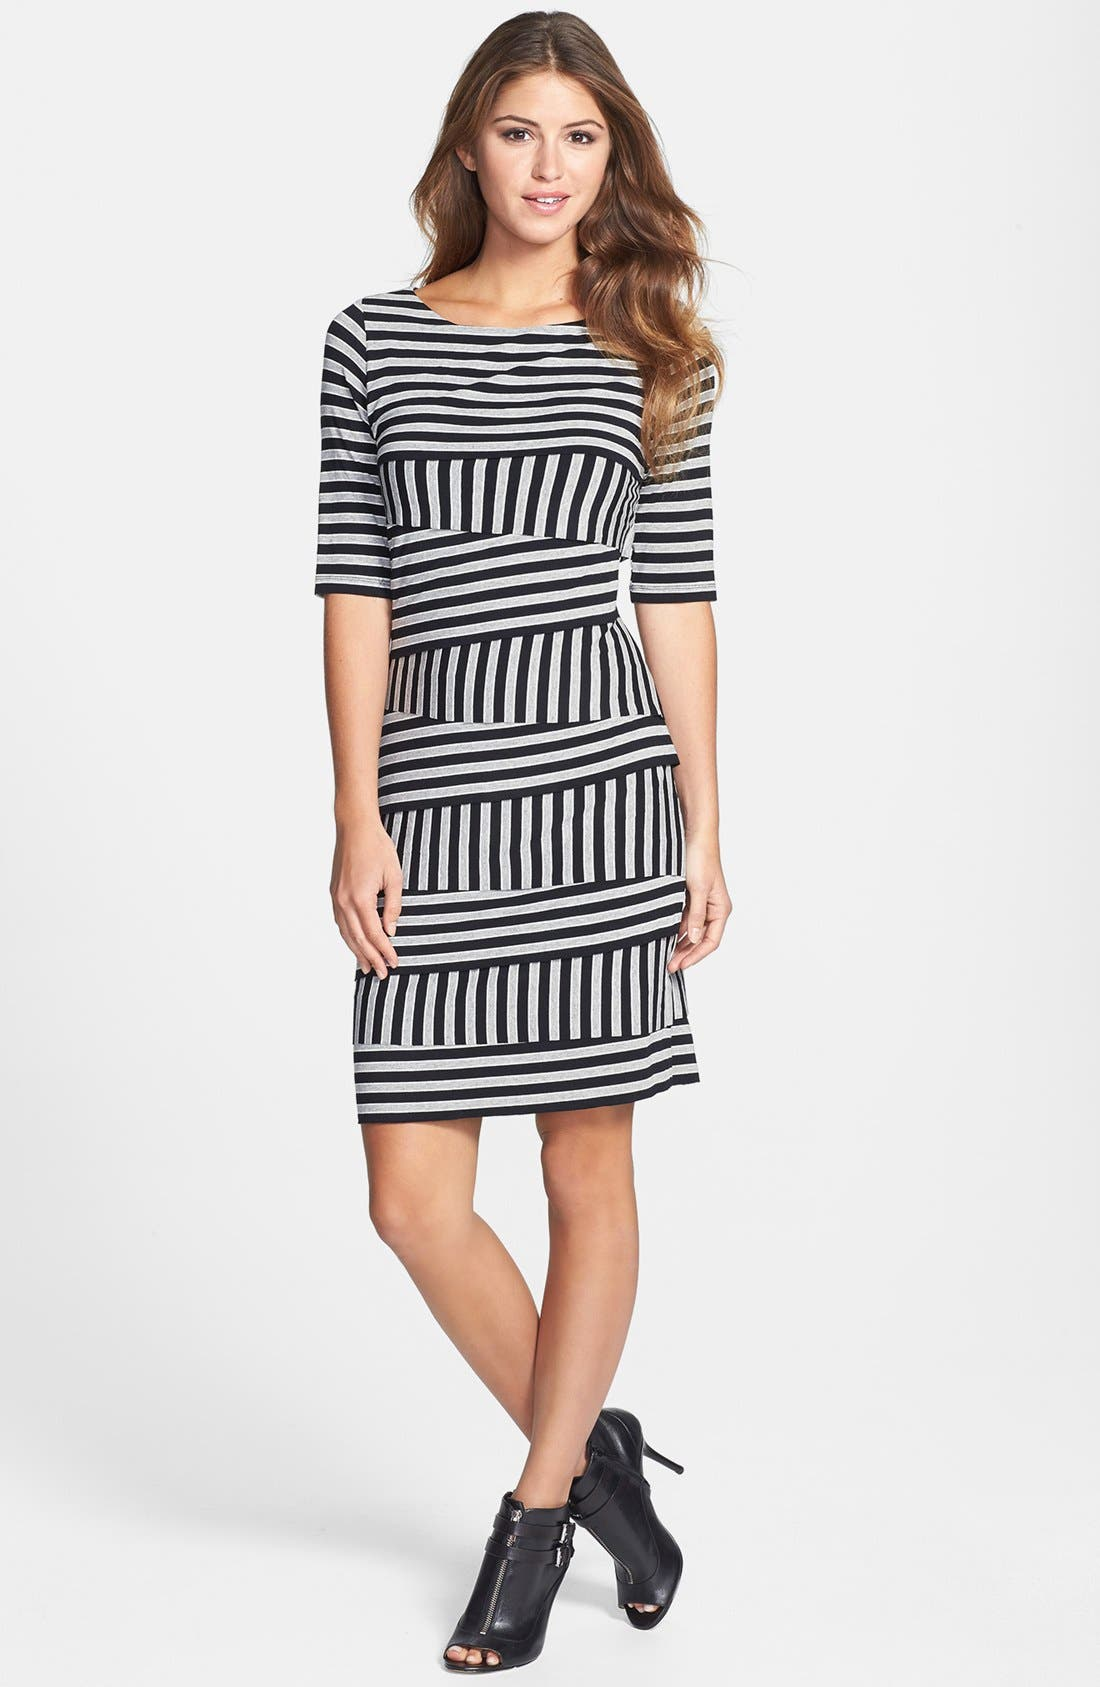 Main Image - Vince Camuto 'Calais' Zigzag Stripe Dress